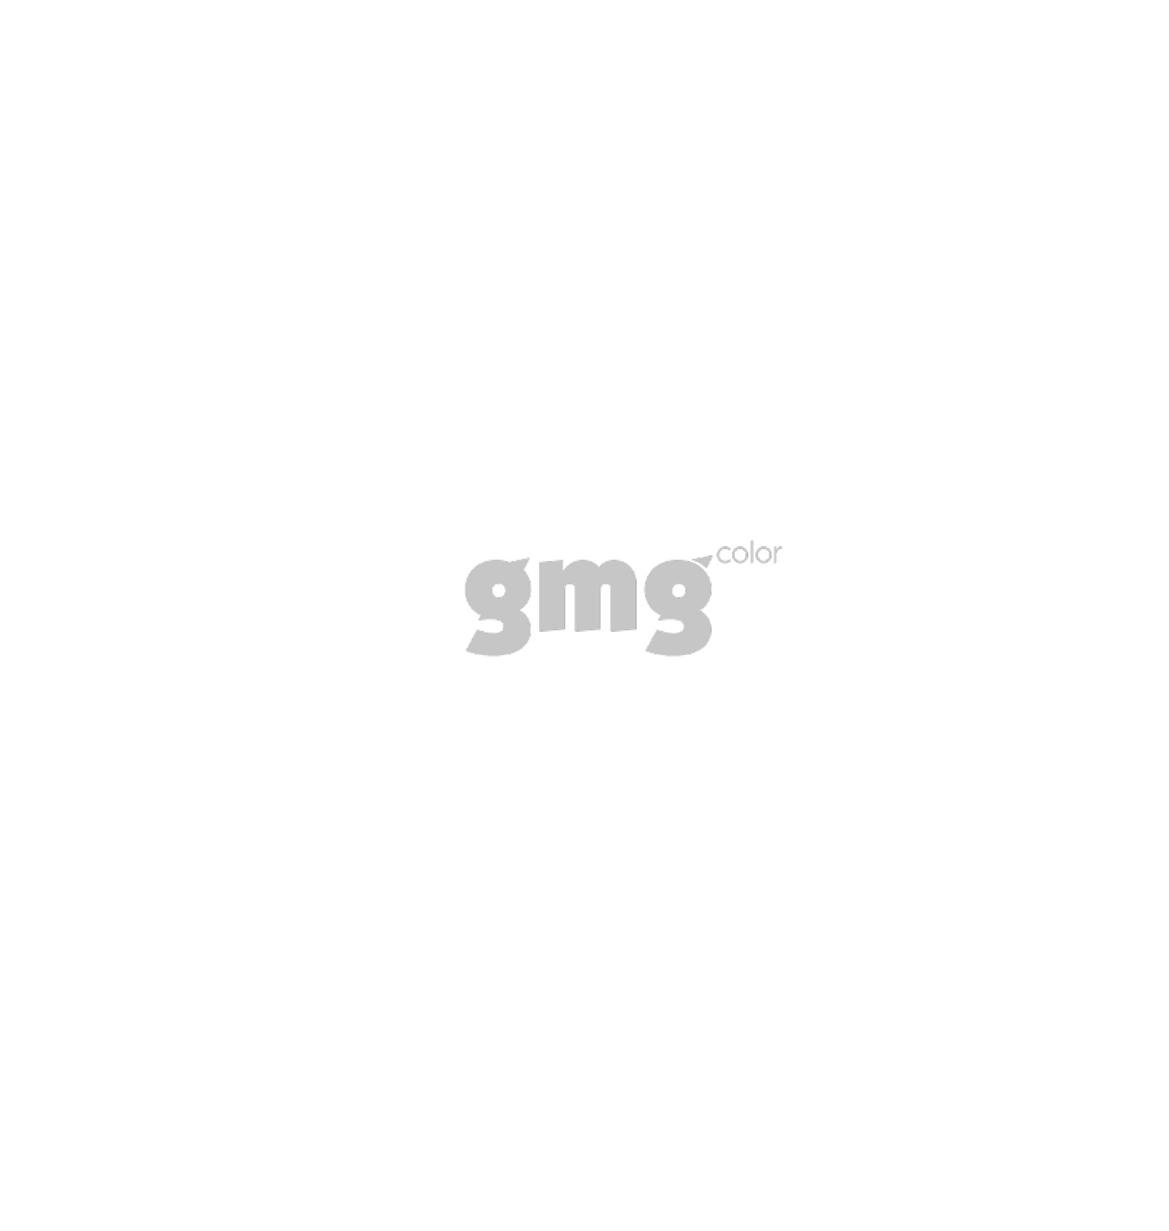 gmg-exe.jpg